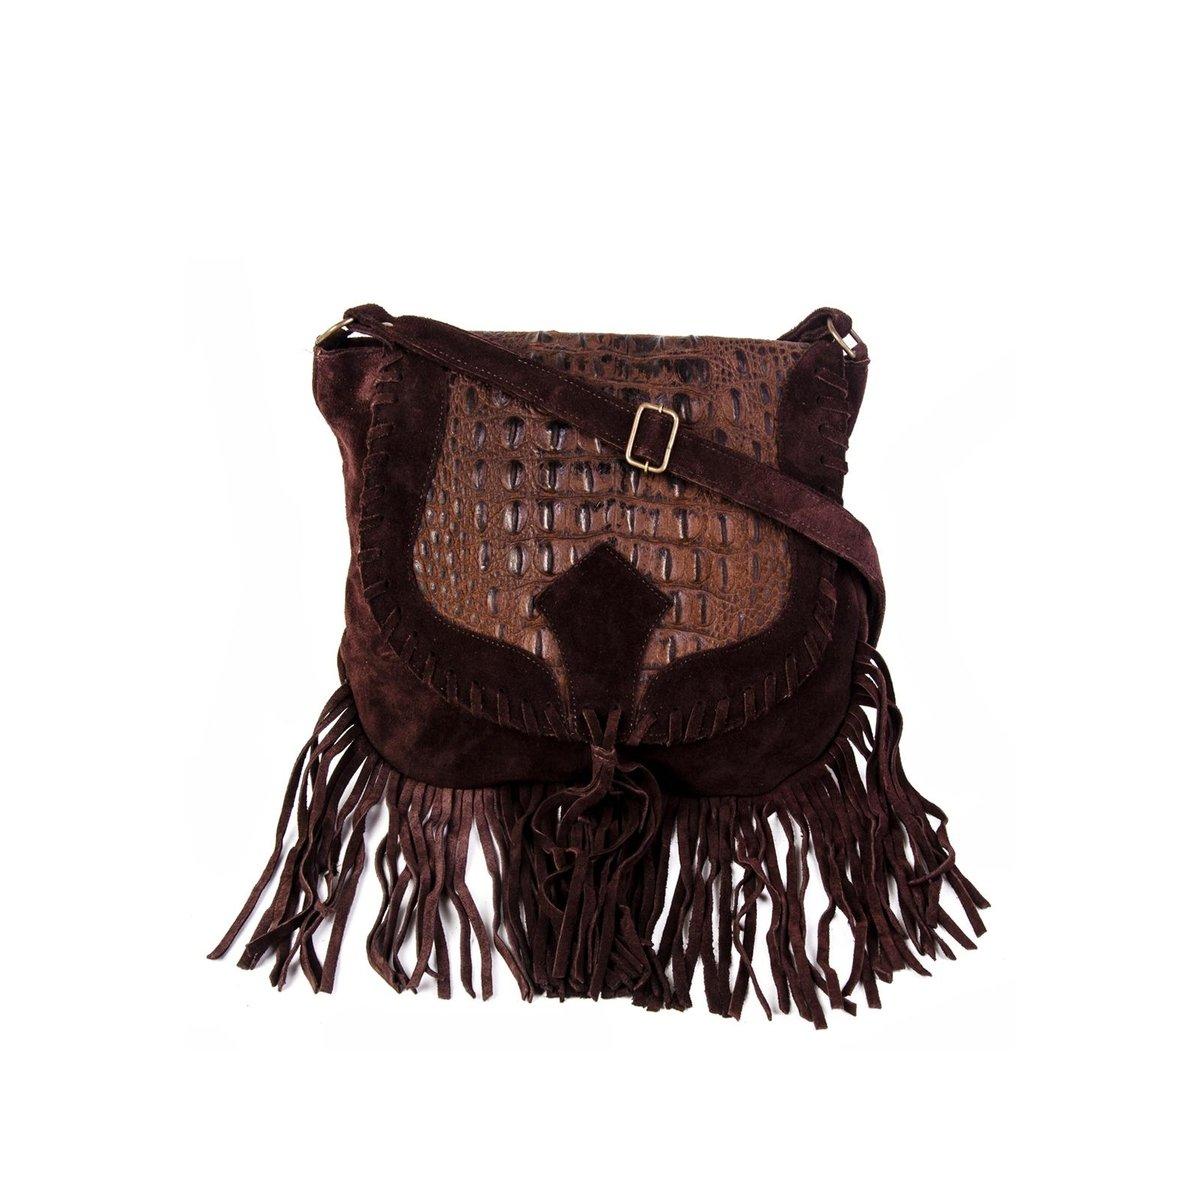 795cd49d2 Bolsa Transversal 100% Couro Franja Modern Feminina - Compre Agora |  Netshoes